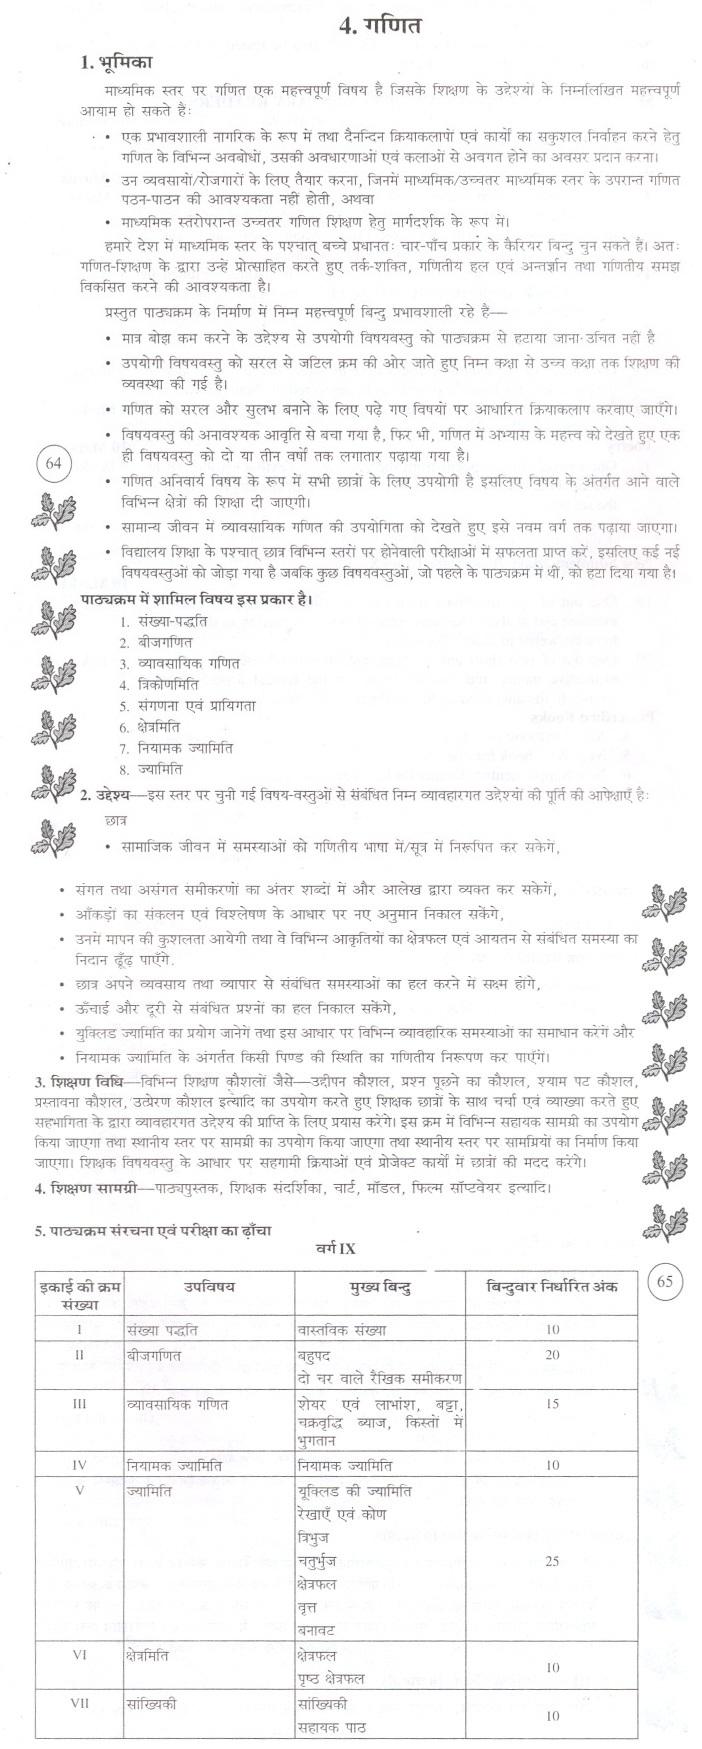 Bihar Board Secondary Syllabus - Maths